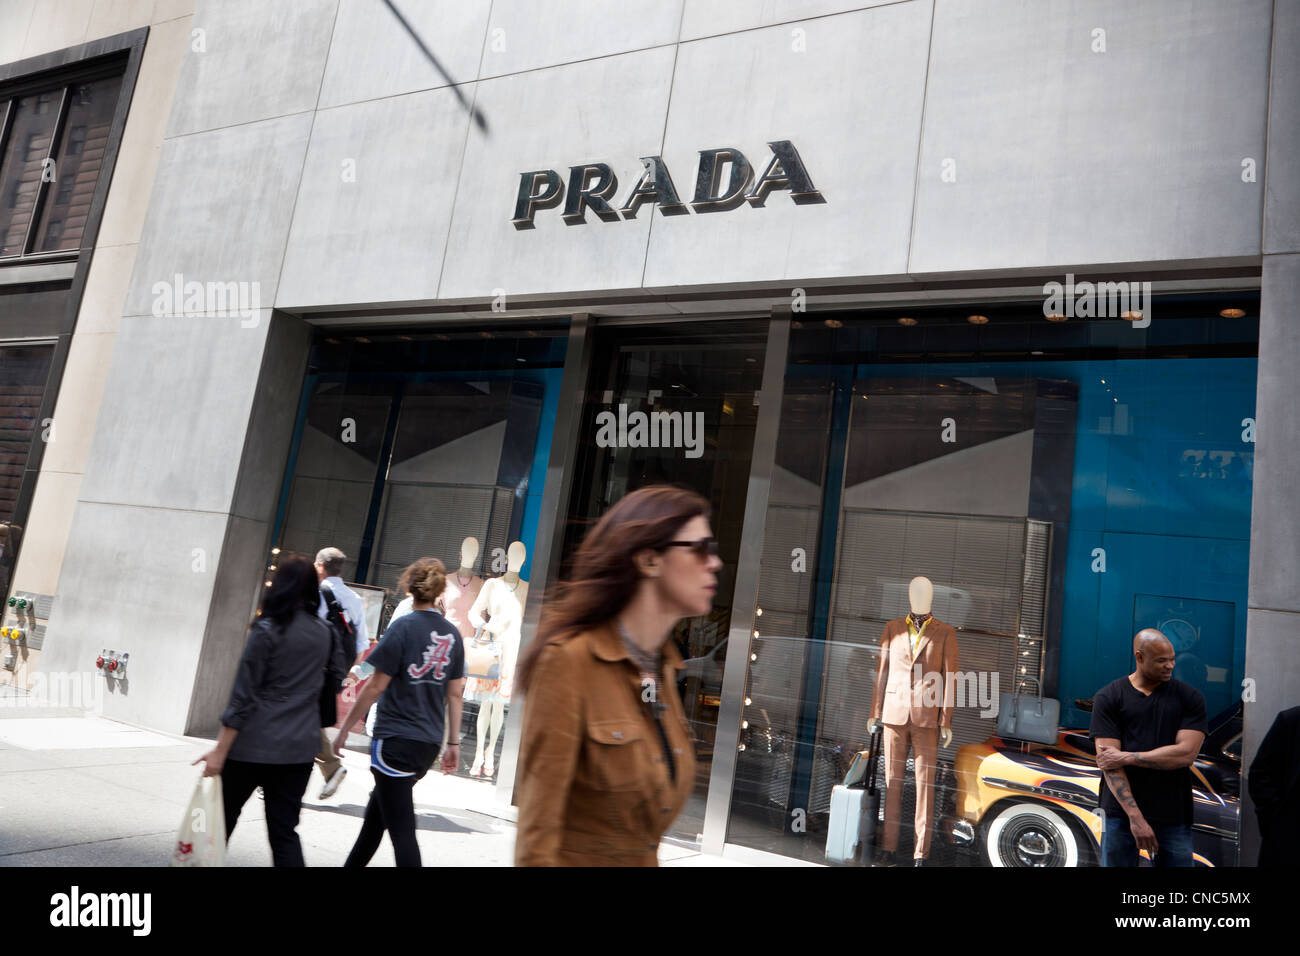 Magasin Prada sur la Cinquième Avenue à Manhattan, New York City Photo Stock 126b58f772a